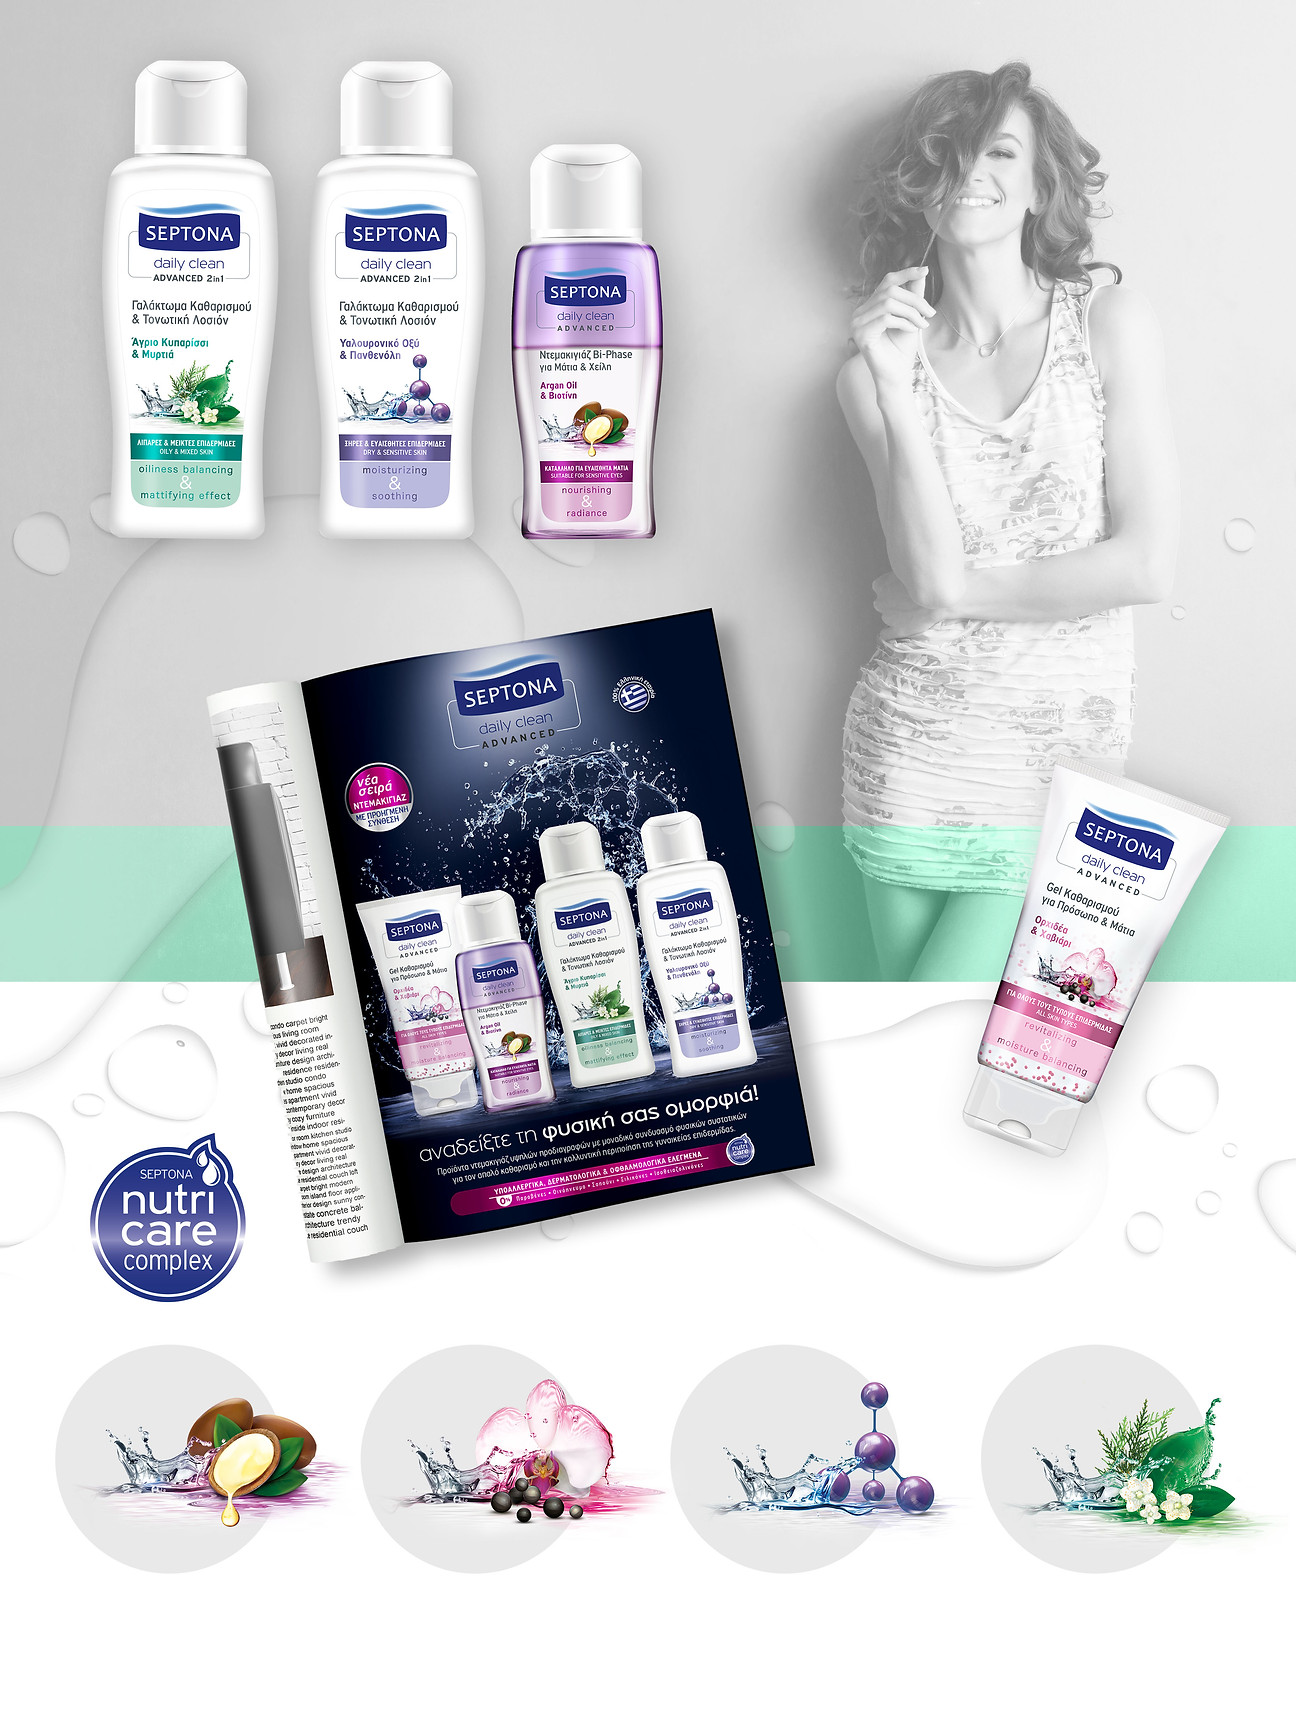 Globus Bc branding agency